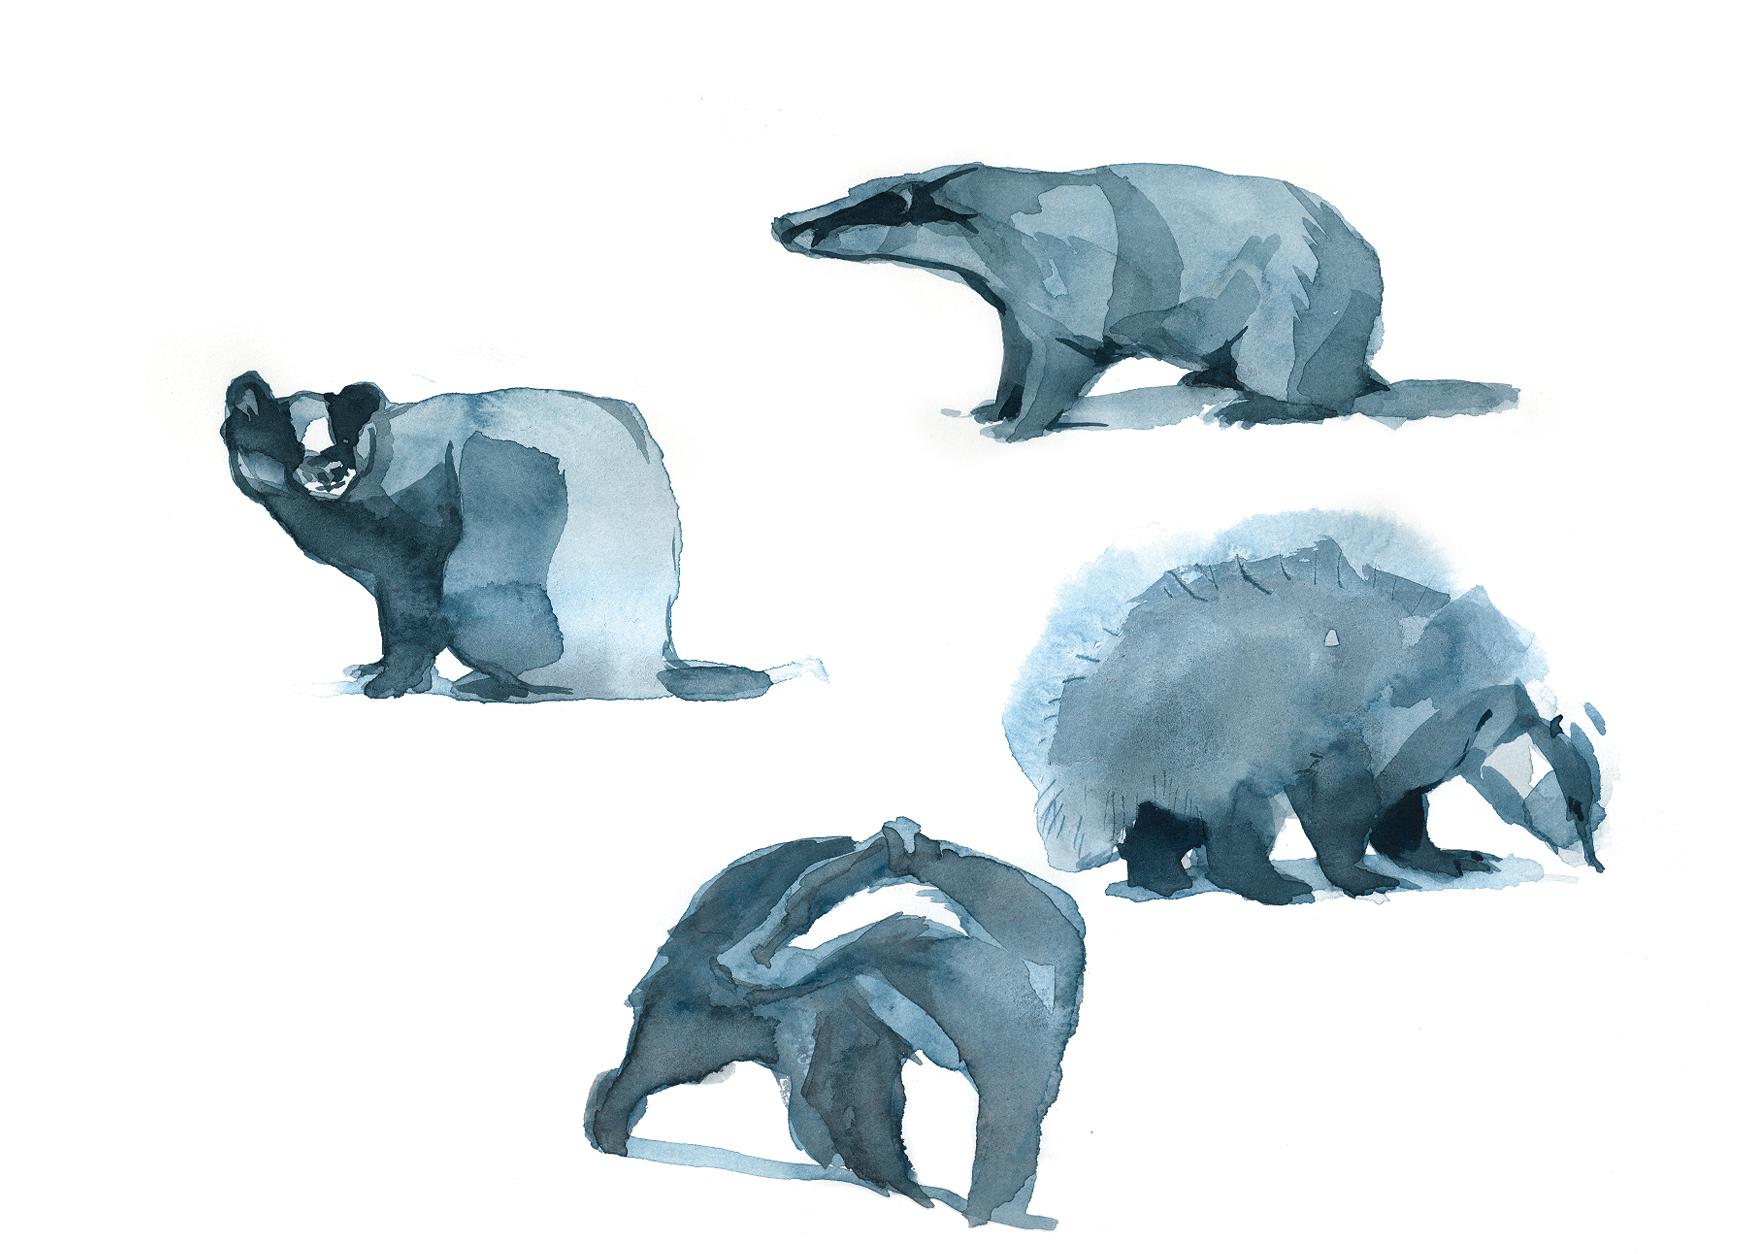 badger_research.jpg